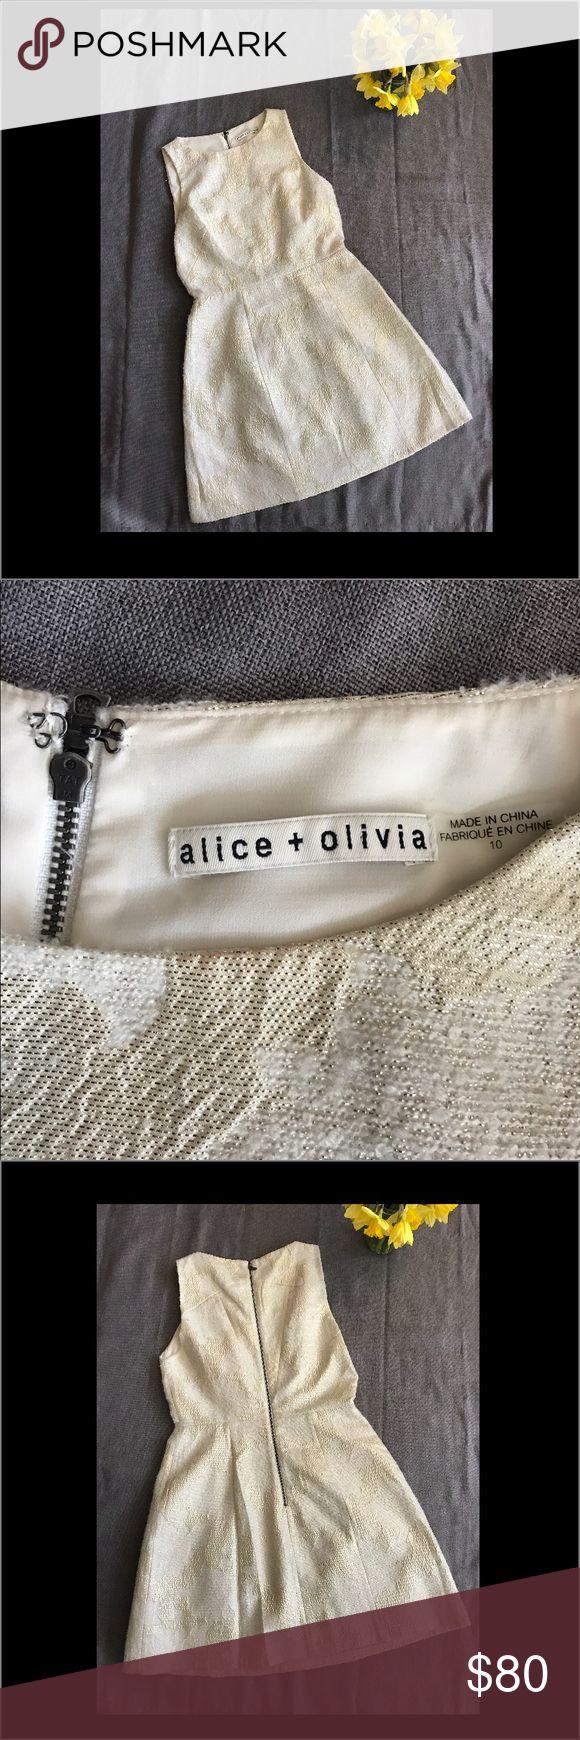 NWOT Alice + Olivia Metallic Mea Jacquard Dress NWOT Alice and Olivia Cream + Metallic Gold Dress size 10. Shell/Exterior 86% Polyester 7% Wool 7% Acrylic Alice + Olivia Dresses Mini